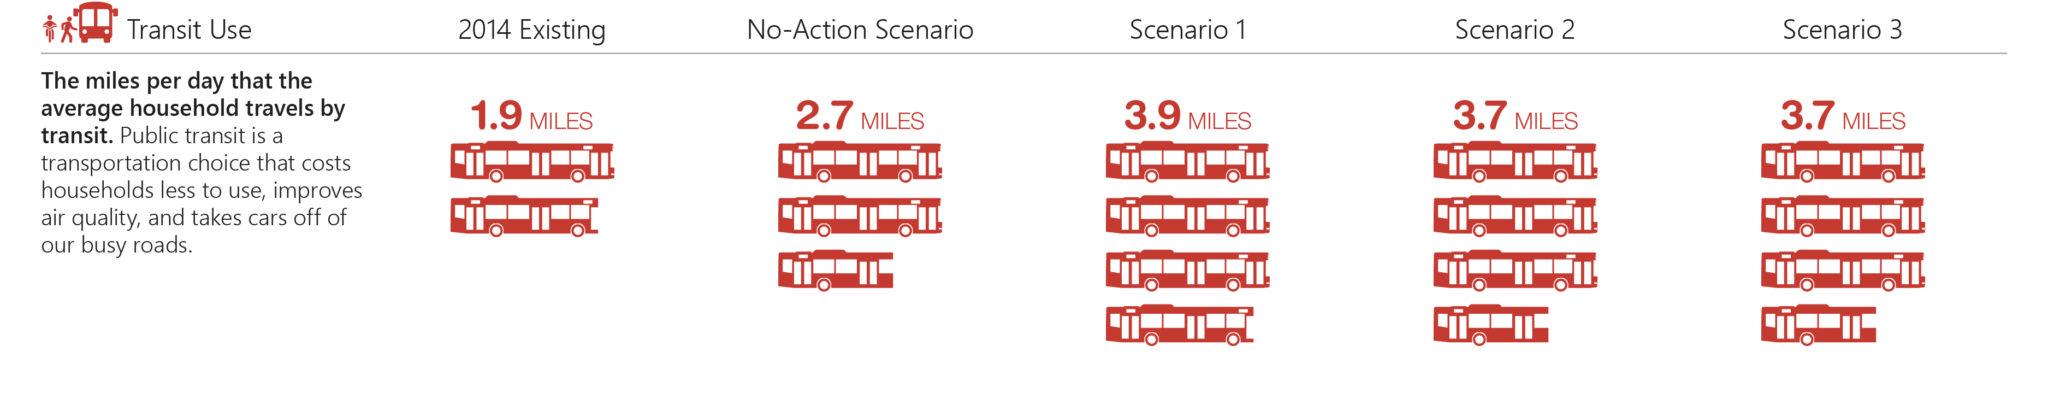 Transit use performance measure.